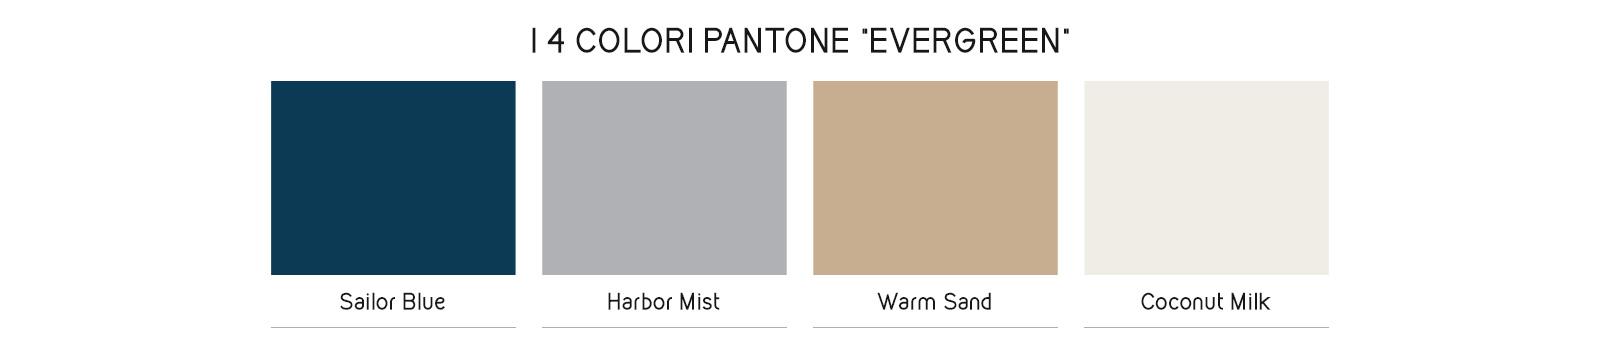 Colori Evergreen estate 2018 Pantone